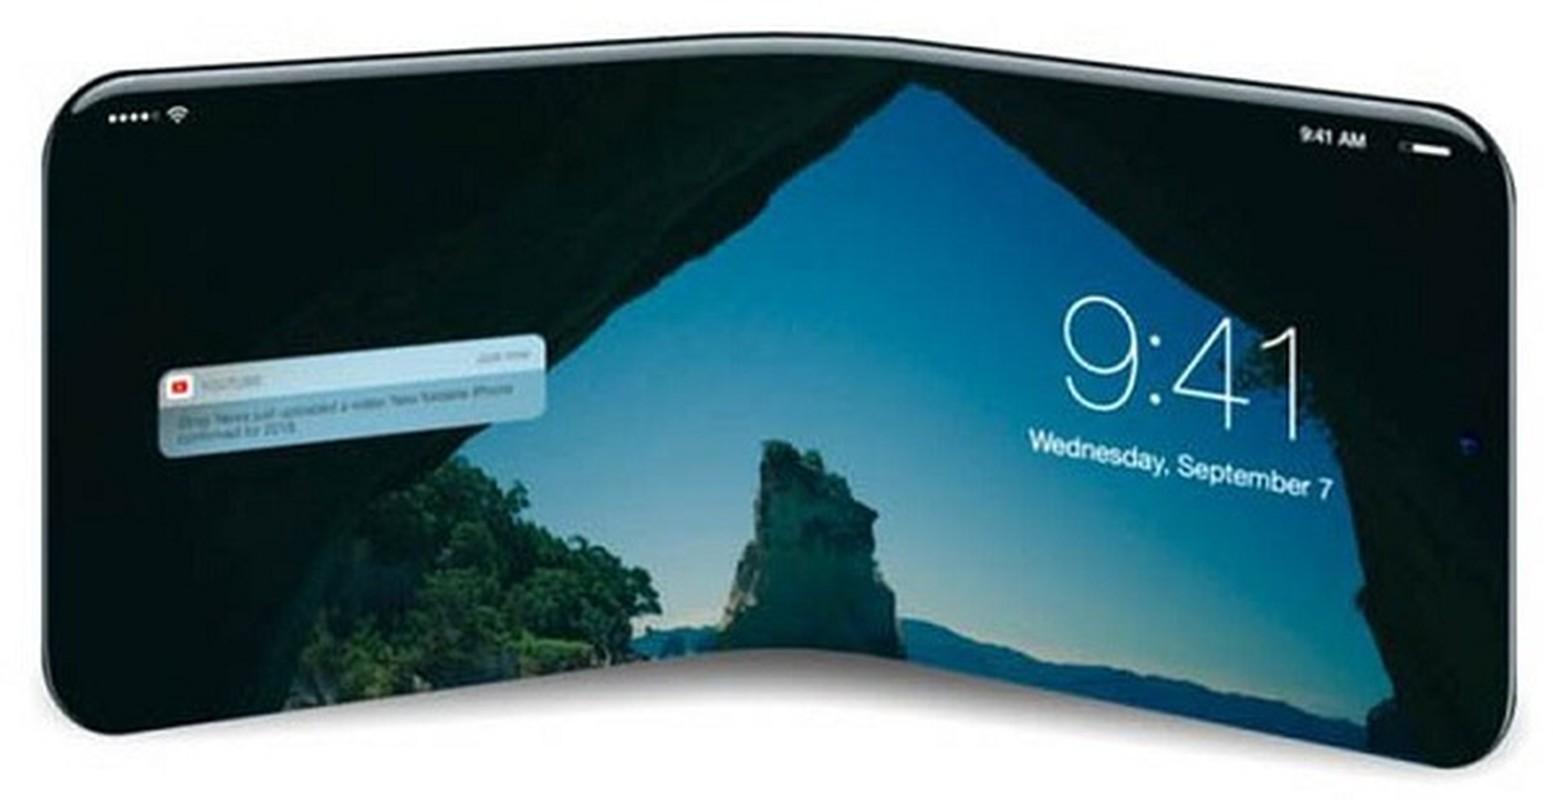 Xuat hien hinh anh iPhone Fold man hinh gap dep het nac-Hinh-7